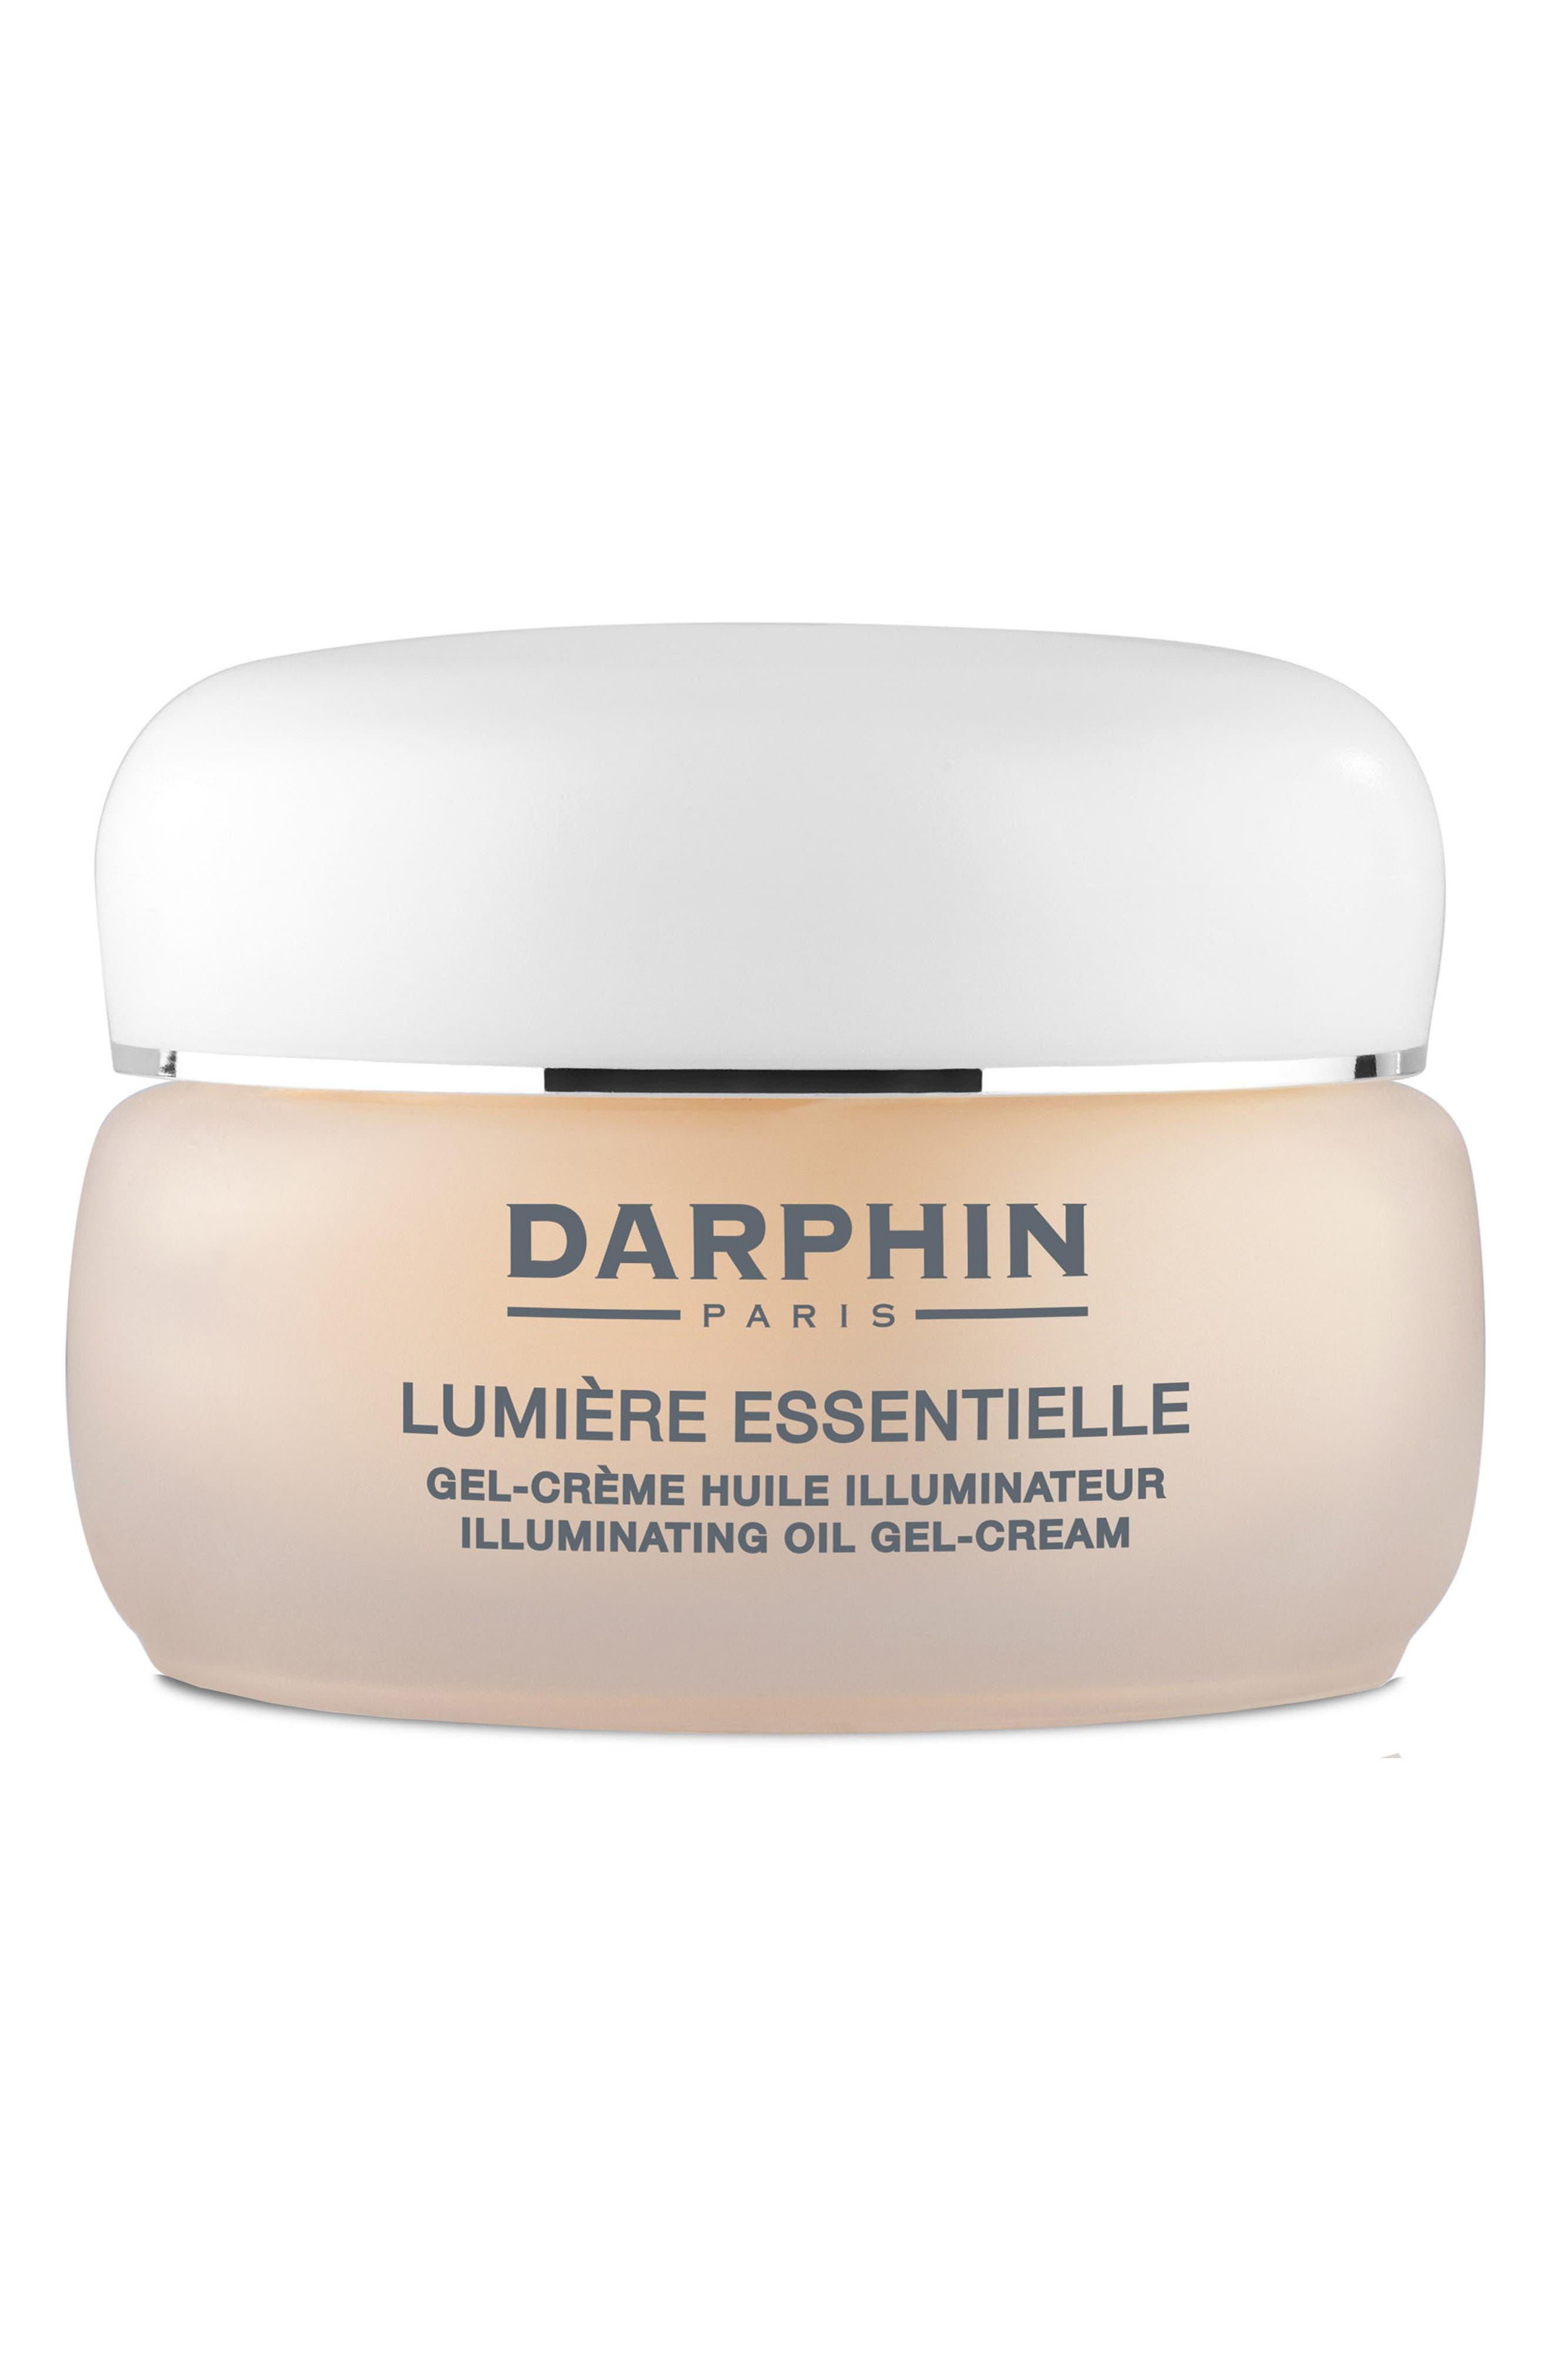 Lumière Essentielle Illuminating Oil Gel-Cream,                         Main,                         color, NO COLOR